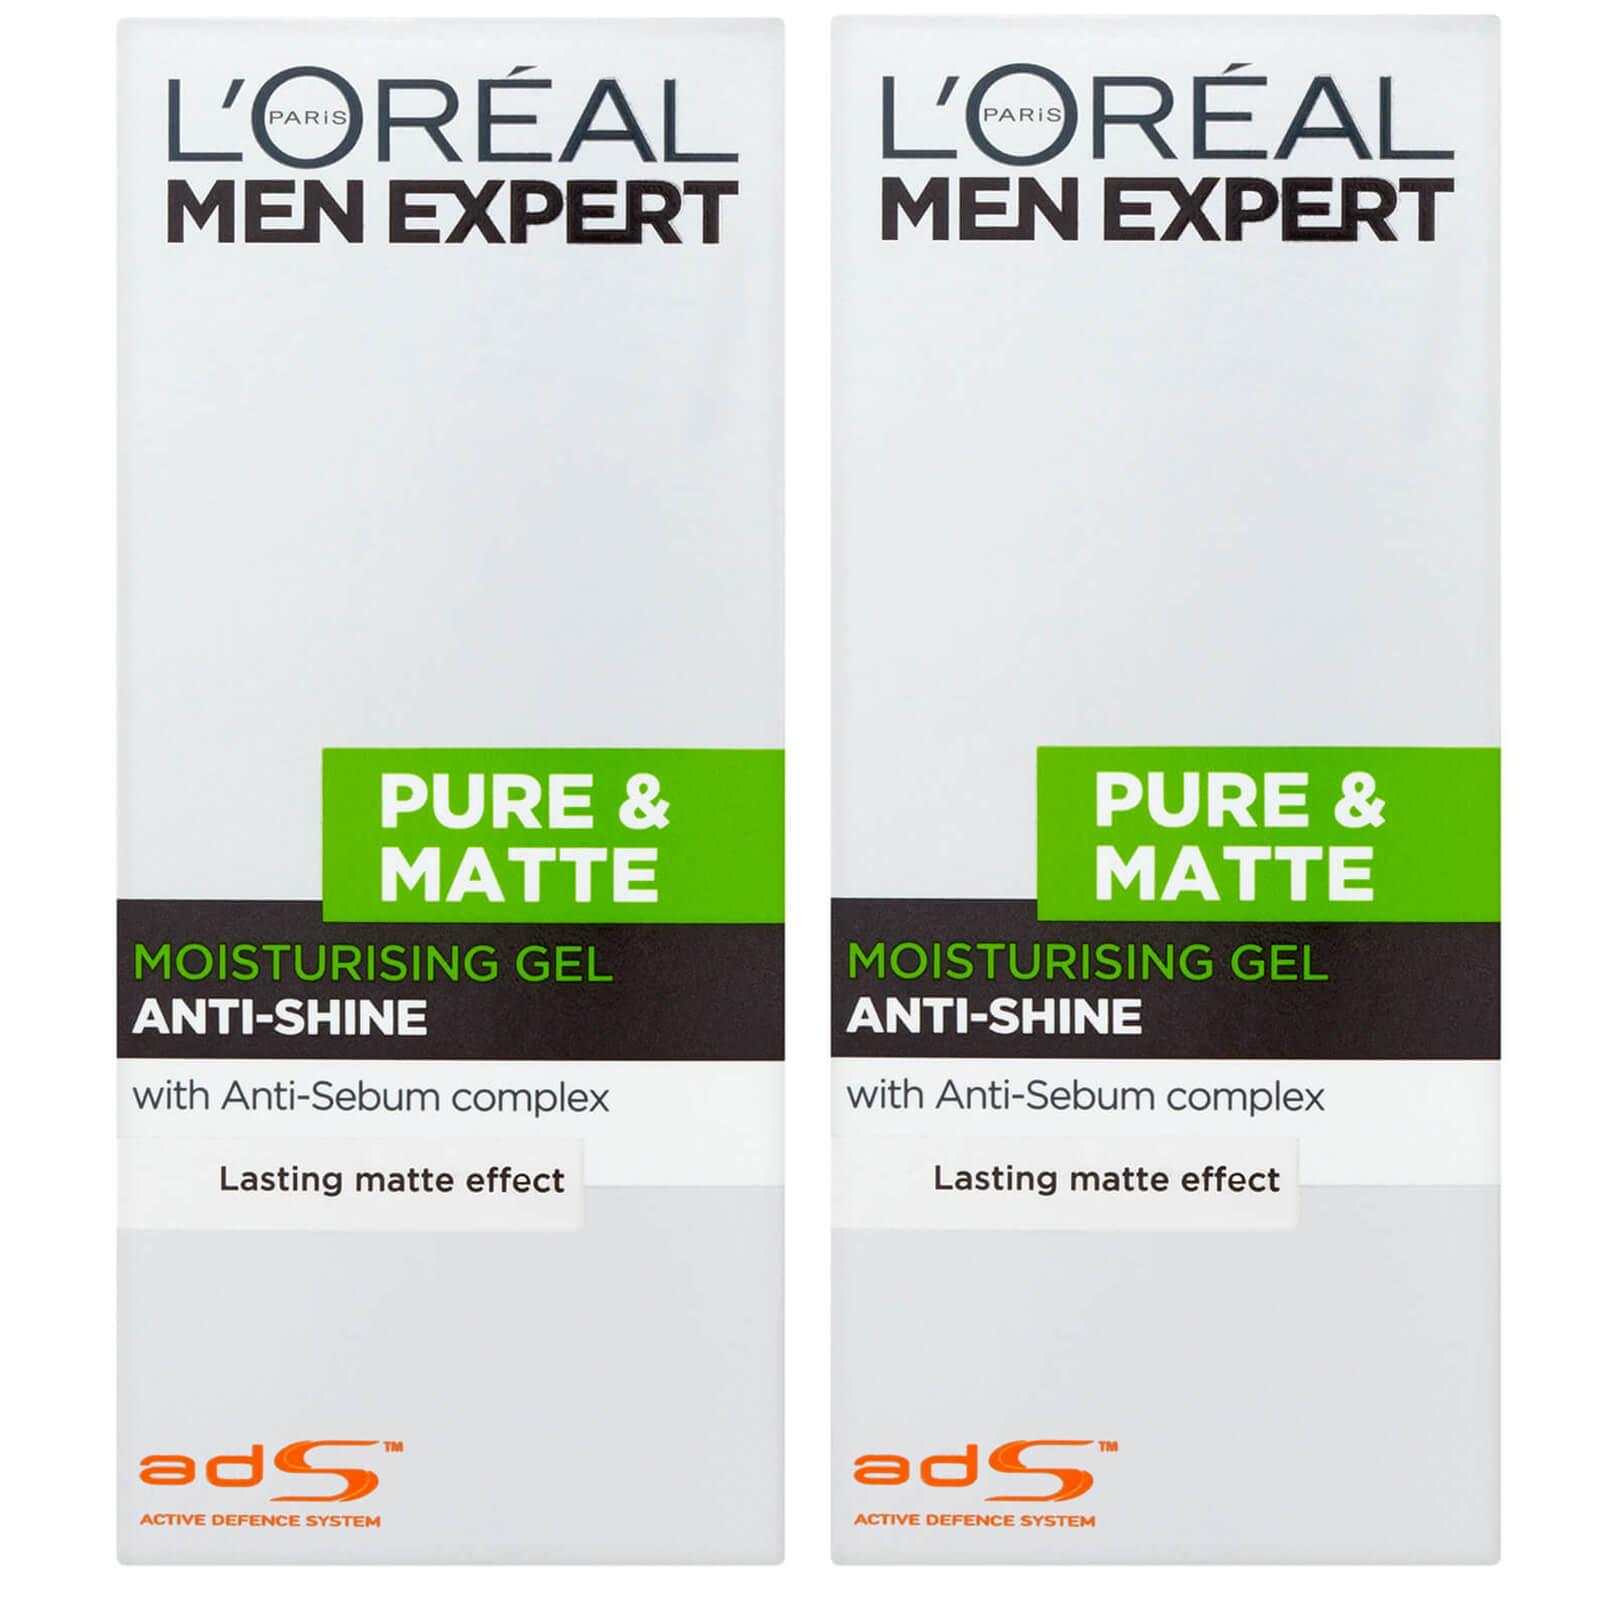 Купить L'Oréal Men Expert Pure and Matte Anti-Shine Gel Moisturiser for Oily Skin 50ml 2 Pack Exclusive